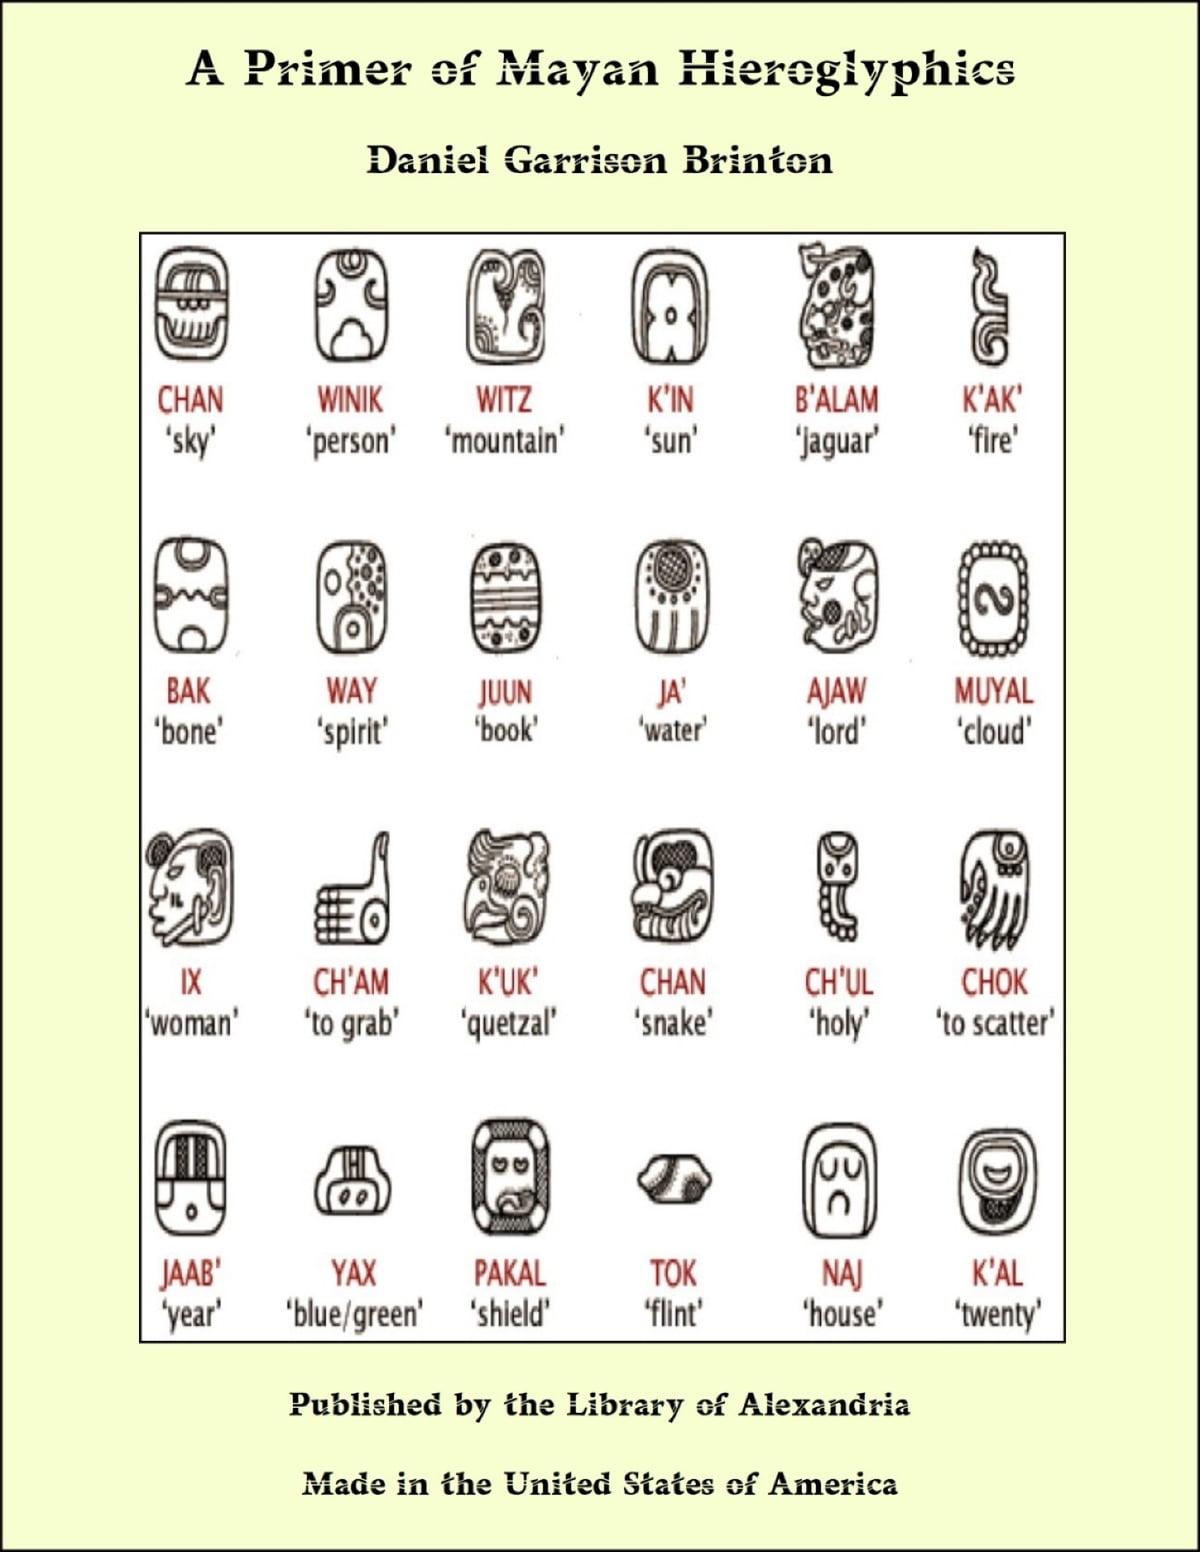 A Primer Of Mayan Hieroglyphics Ebook Di Daniel Garrison